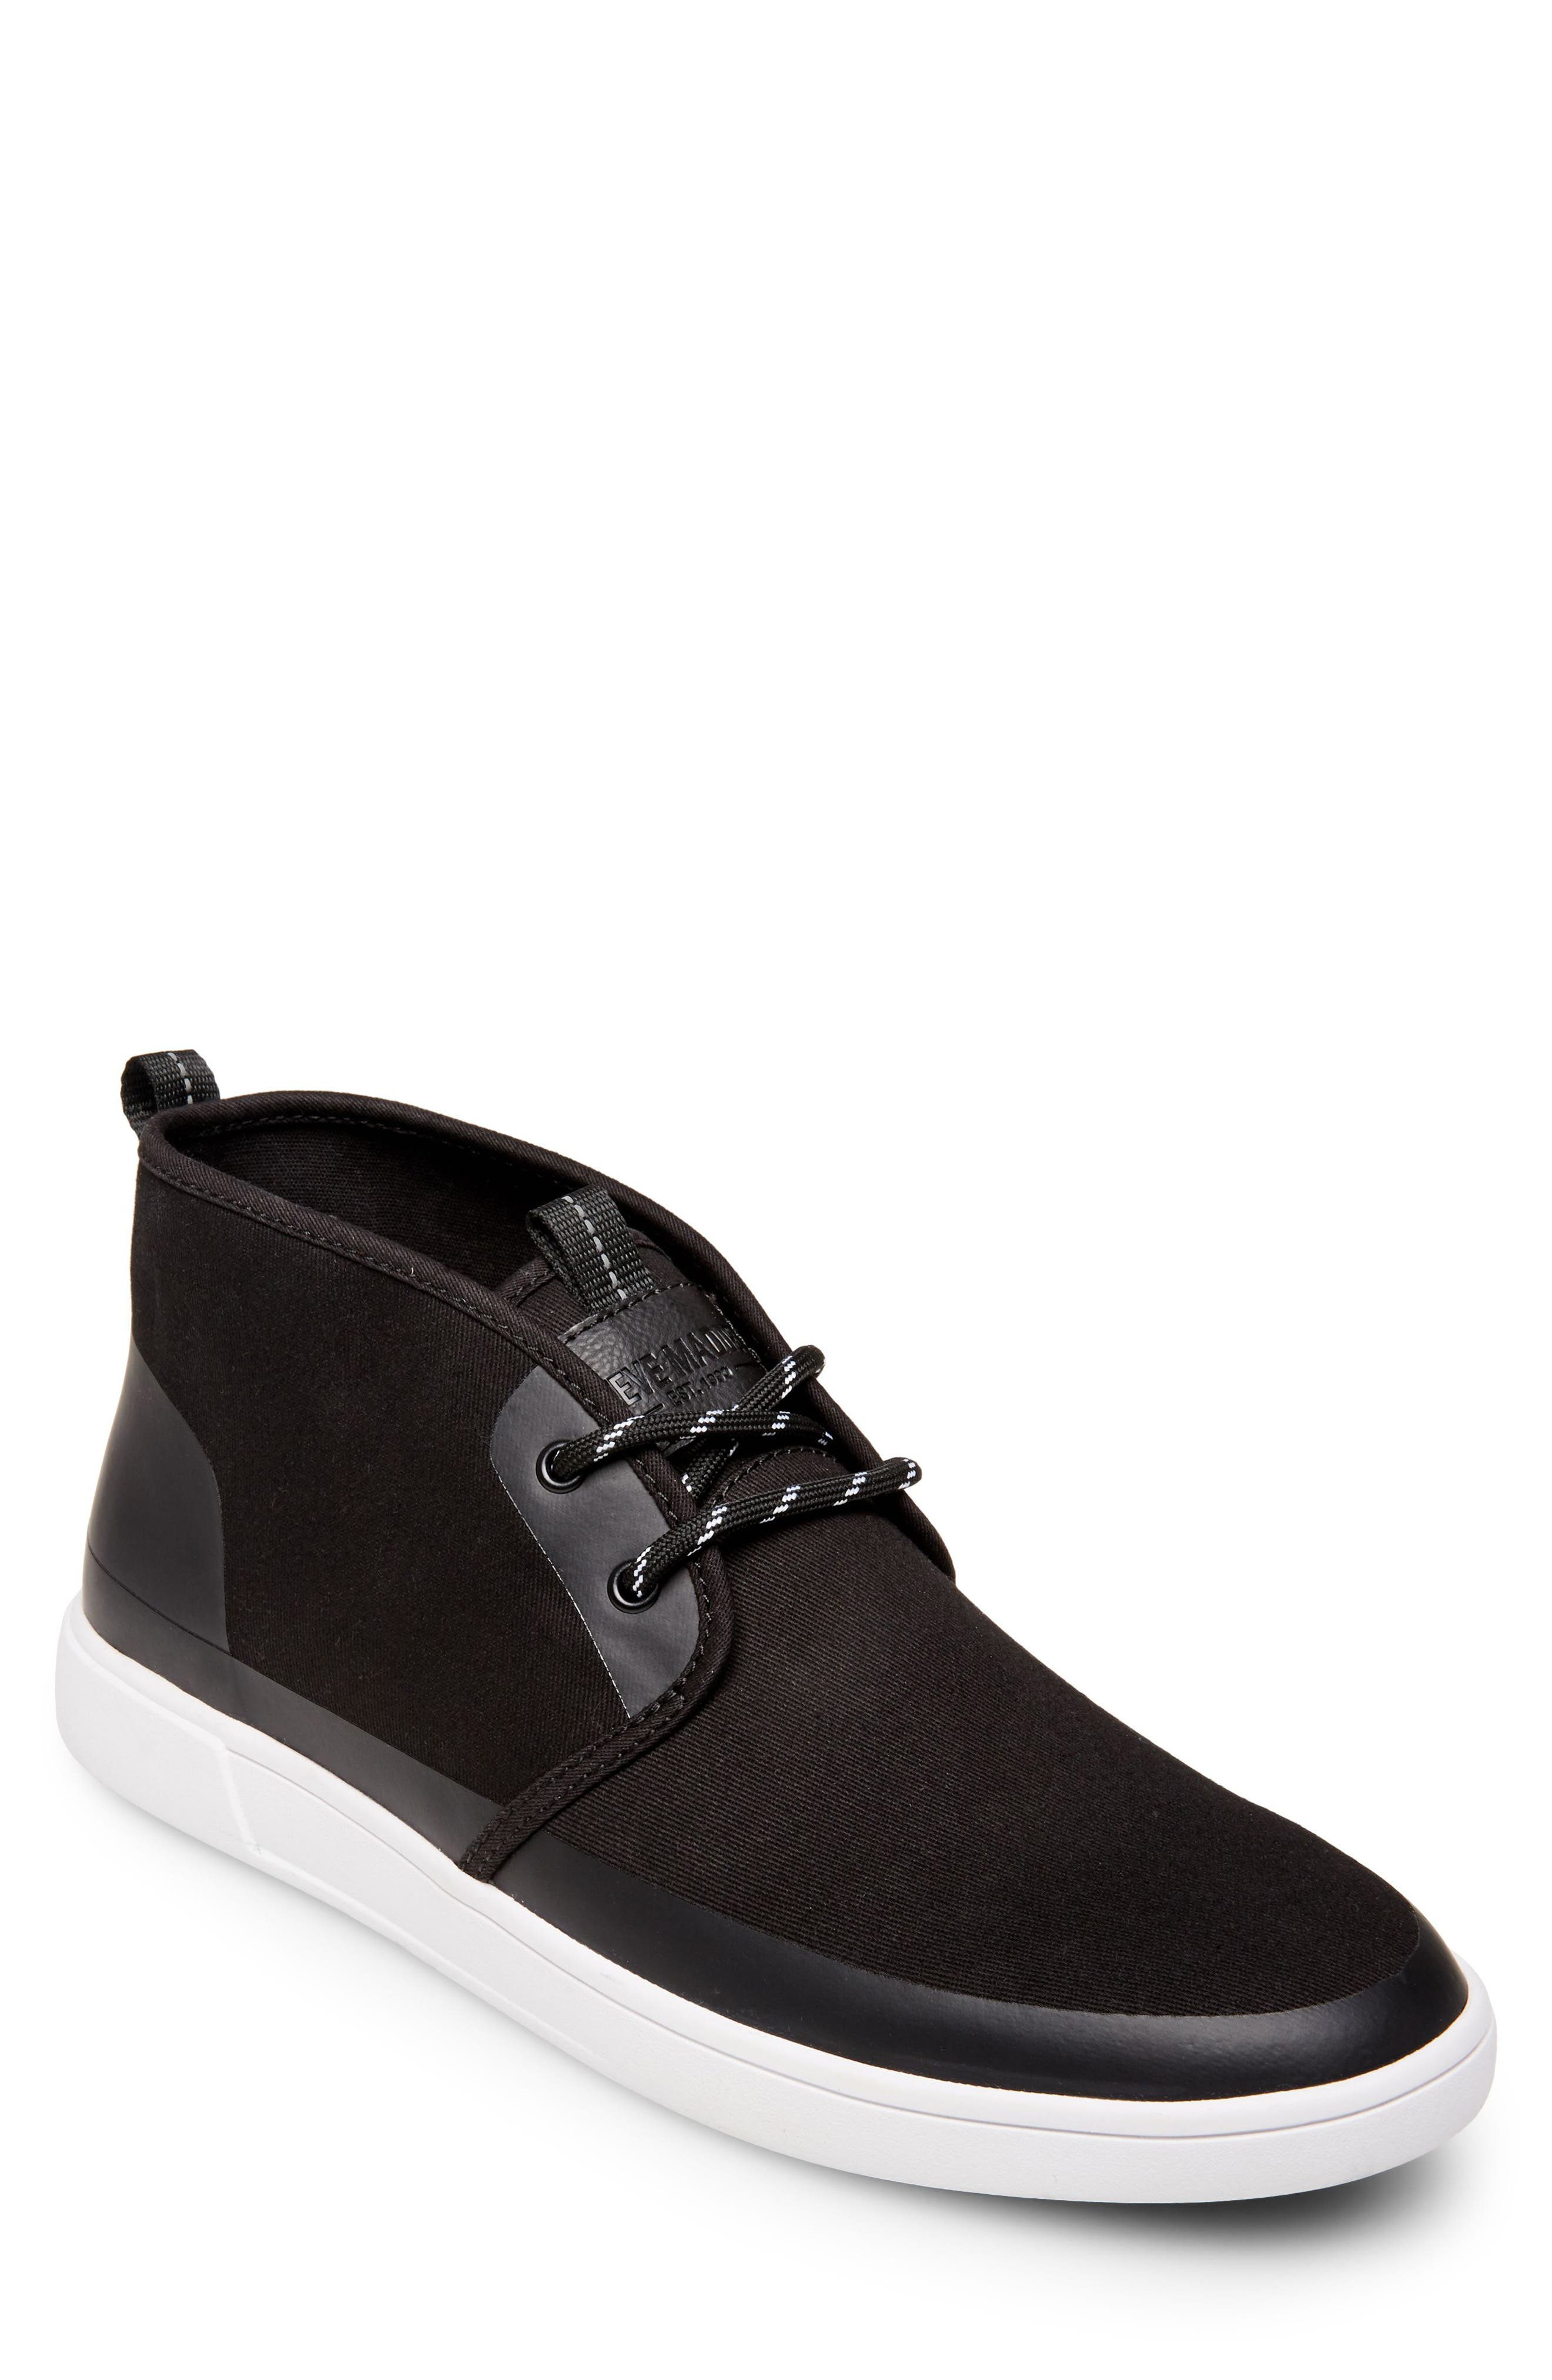 Franklyn Chukka Sneaker,                         Main,                         color, Black Fabric